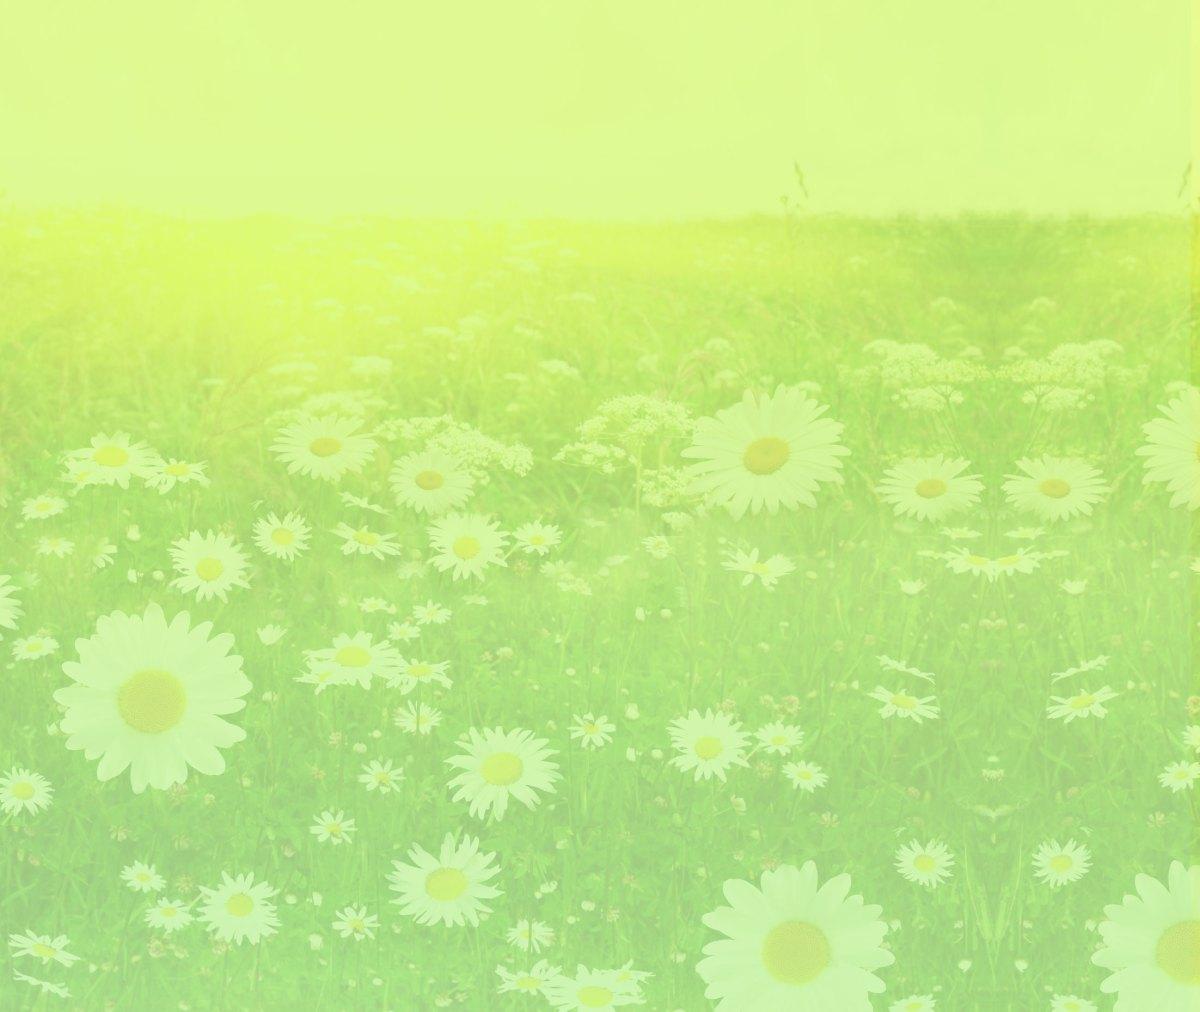 background daisys yellow